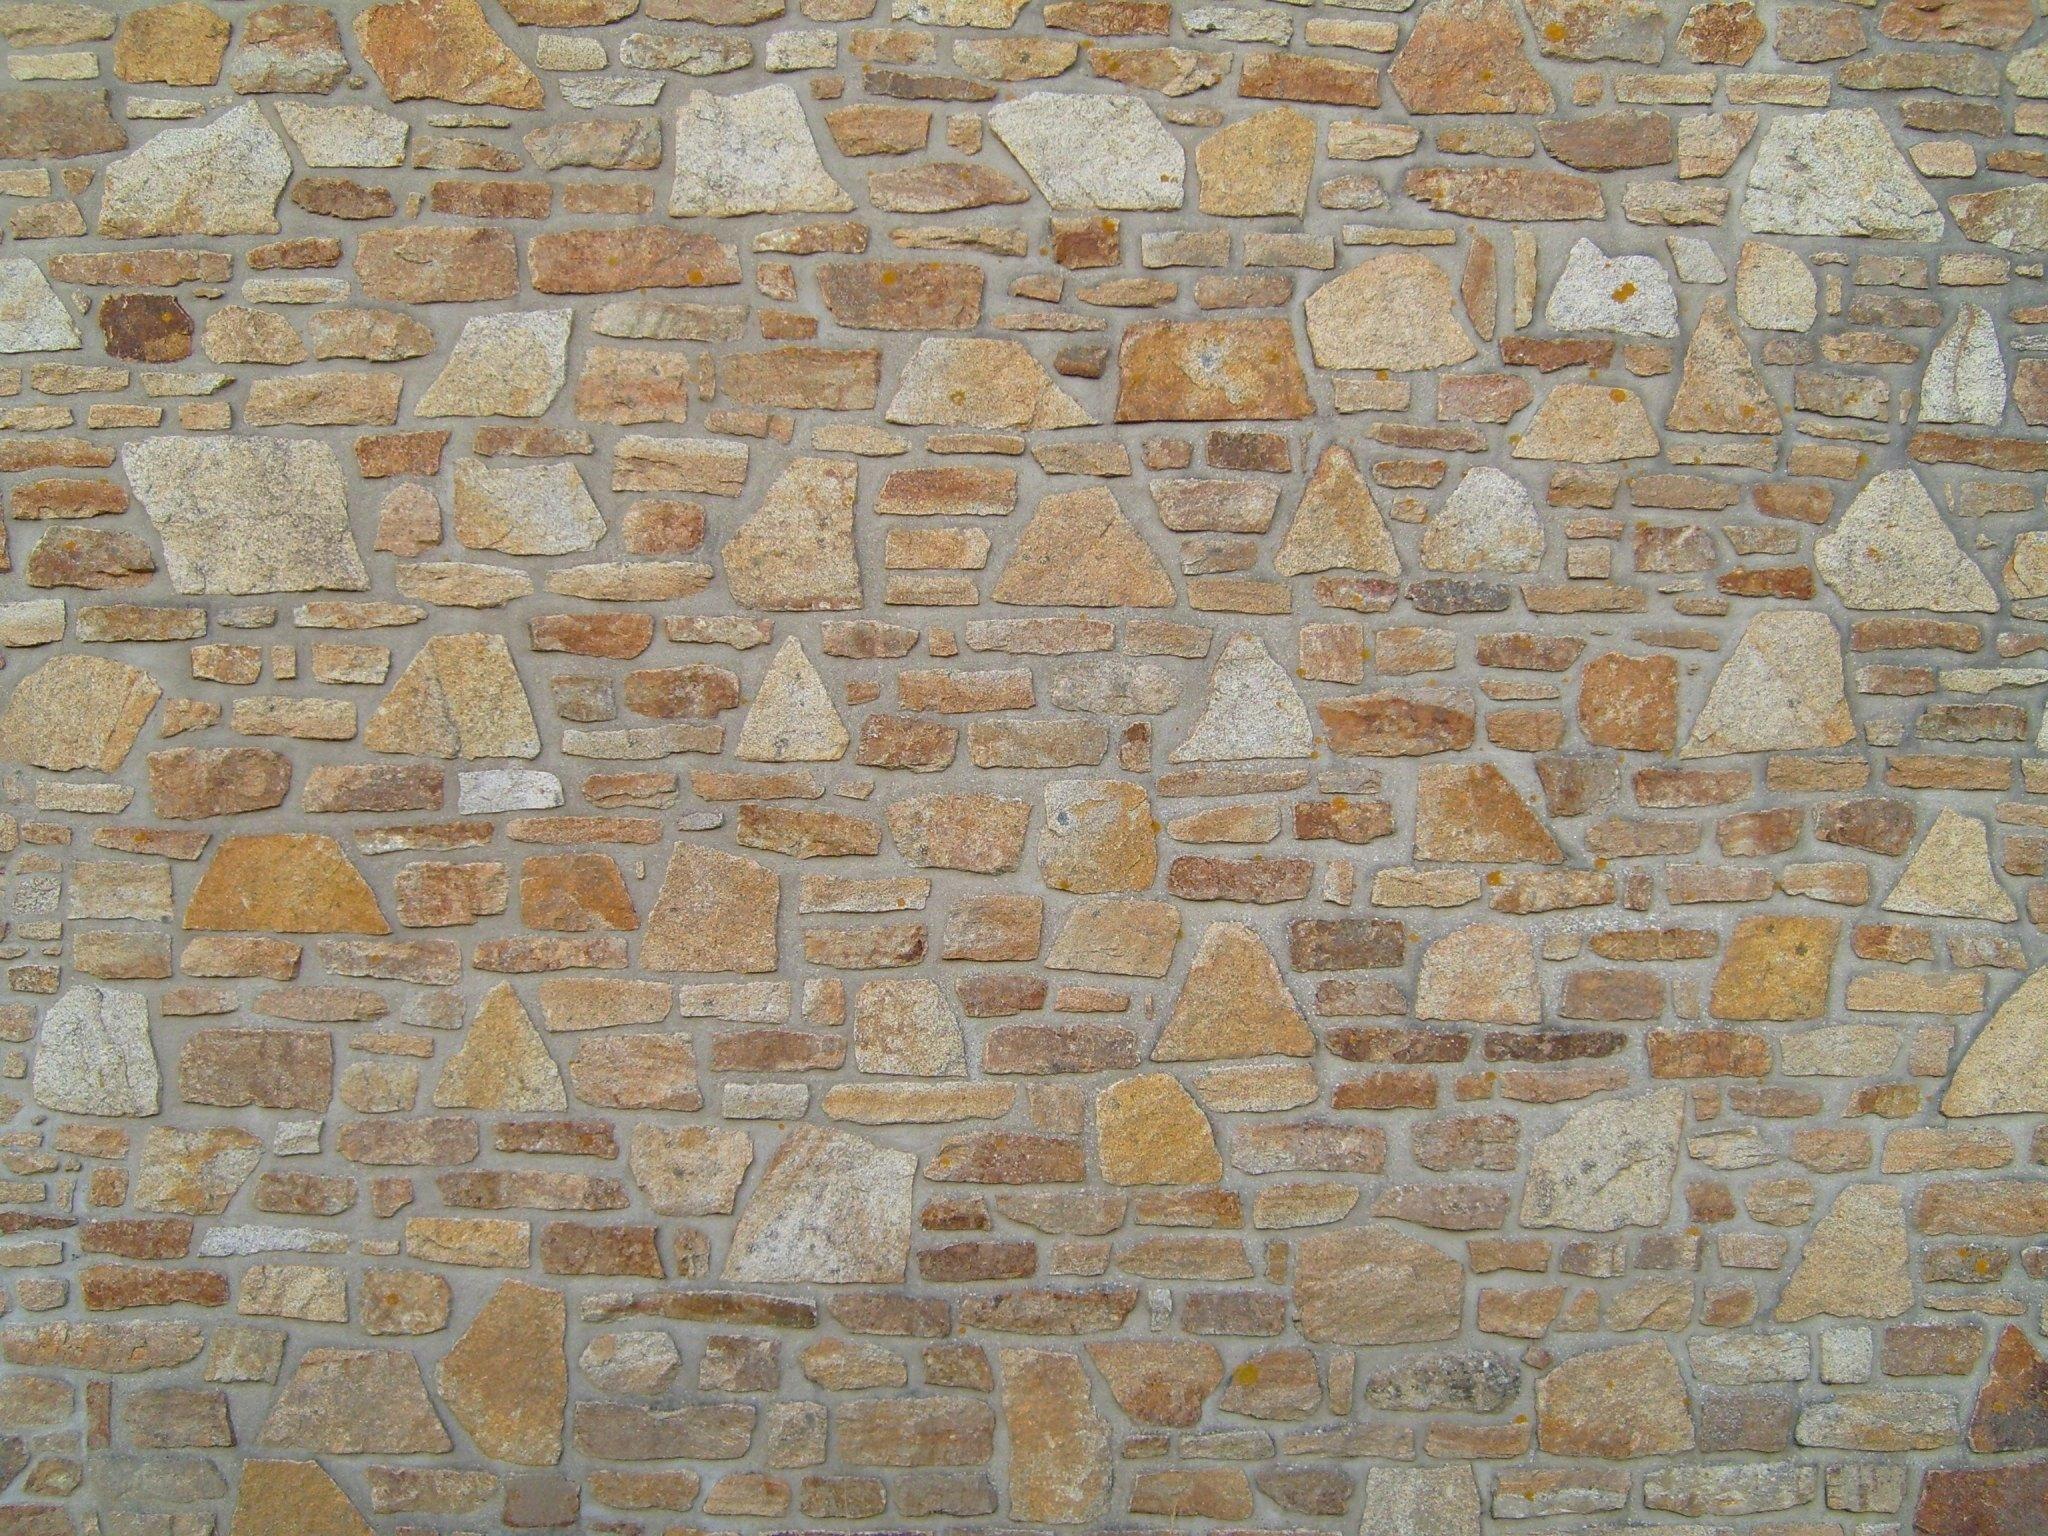 Texture Floor Wall Stone Pattern Artistic Brown Rough Exterior Stone Wall  Brick Material Textured Art Brickwork